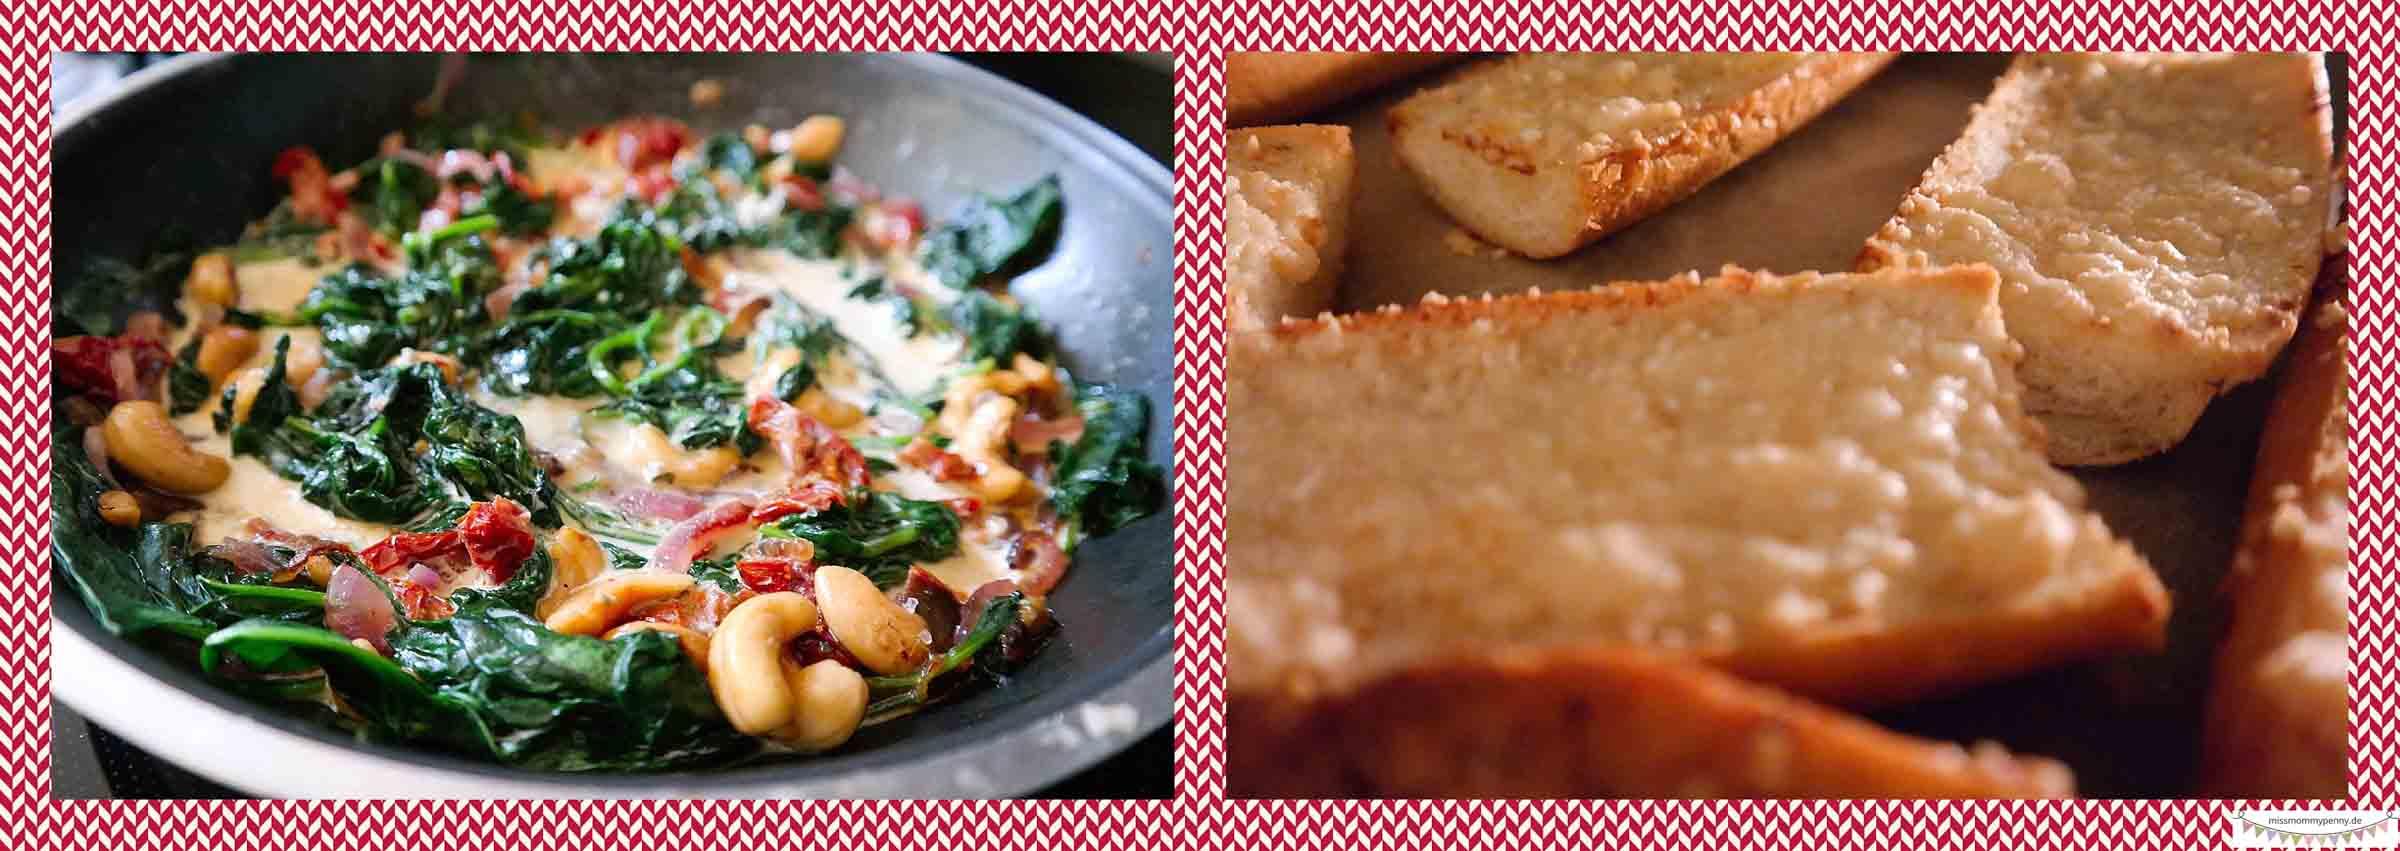 Gorgonzolaspinat mit Parmesanbroten